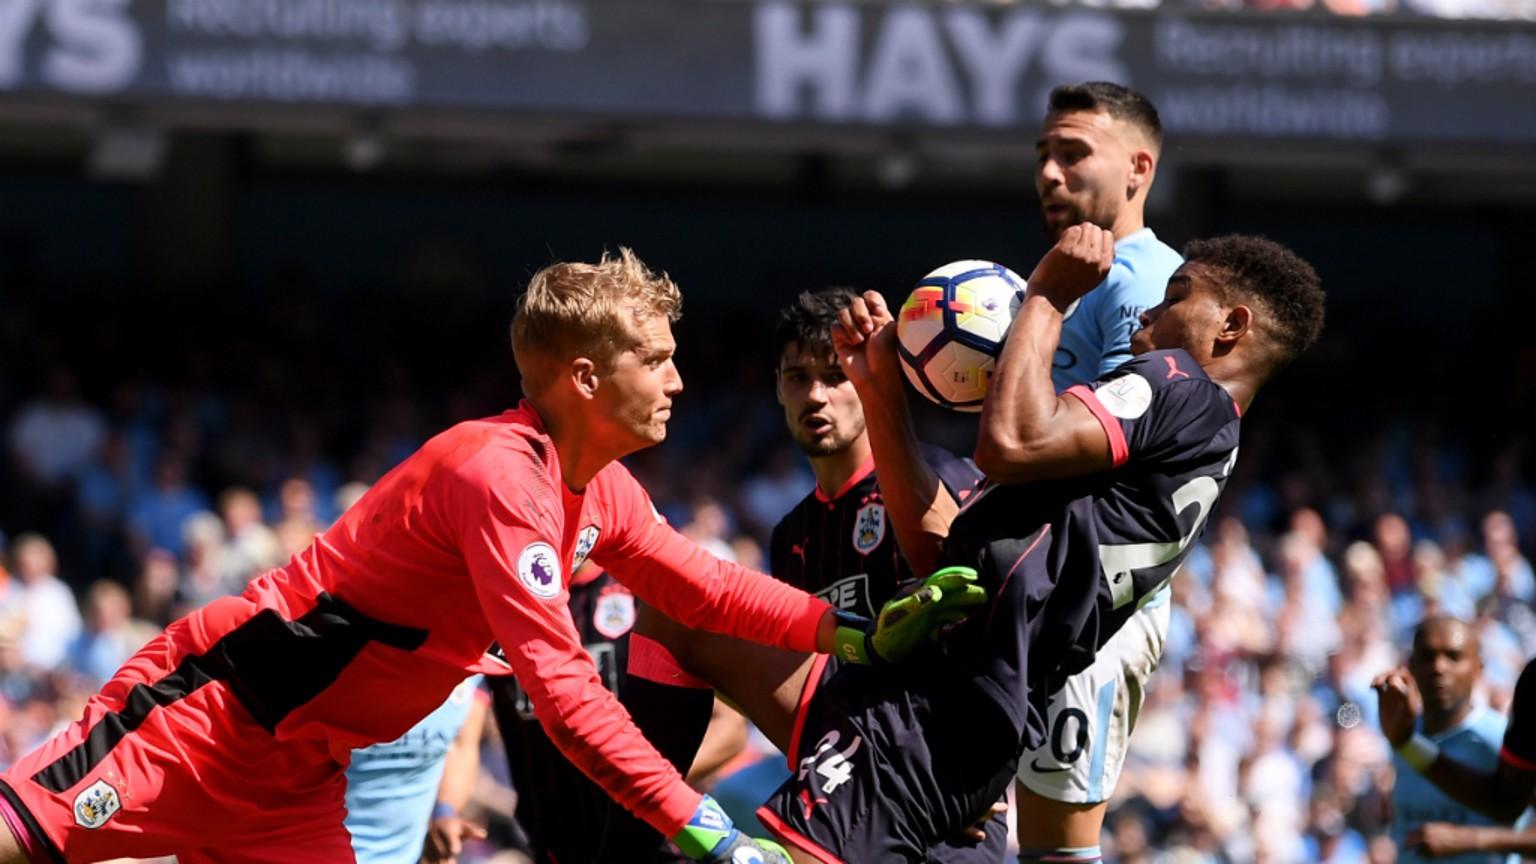 Man City 0x0 Huddersfield